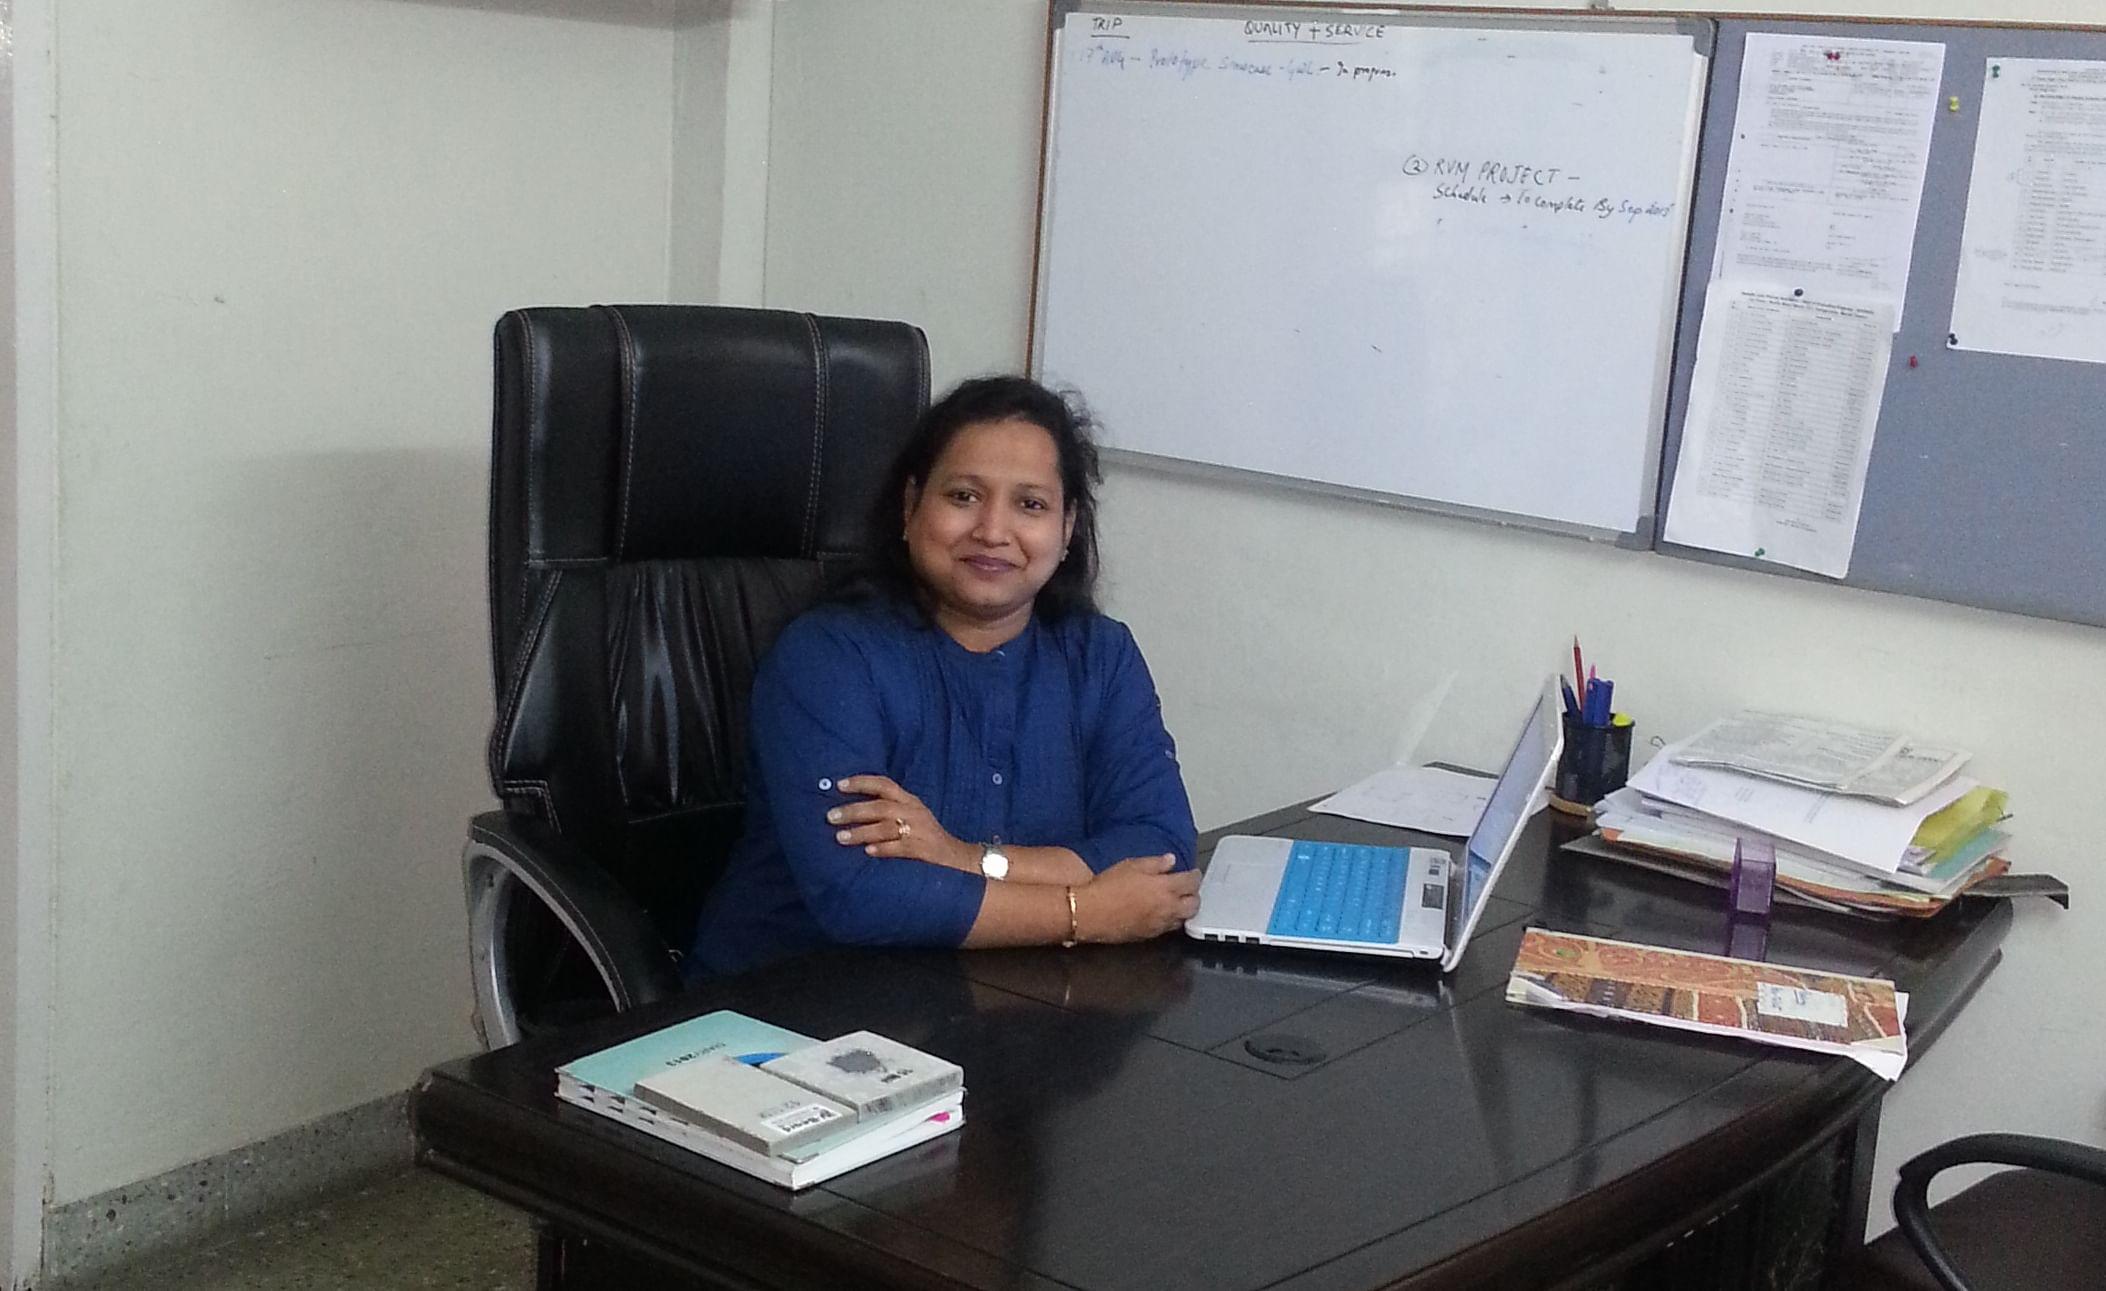 Namita Banka, founder of Banka Bioloo